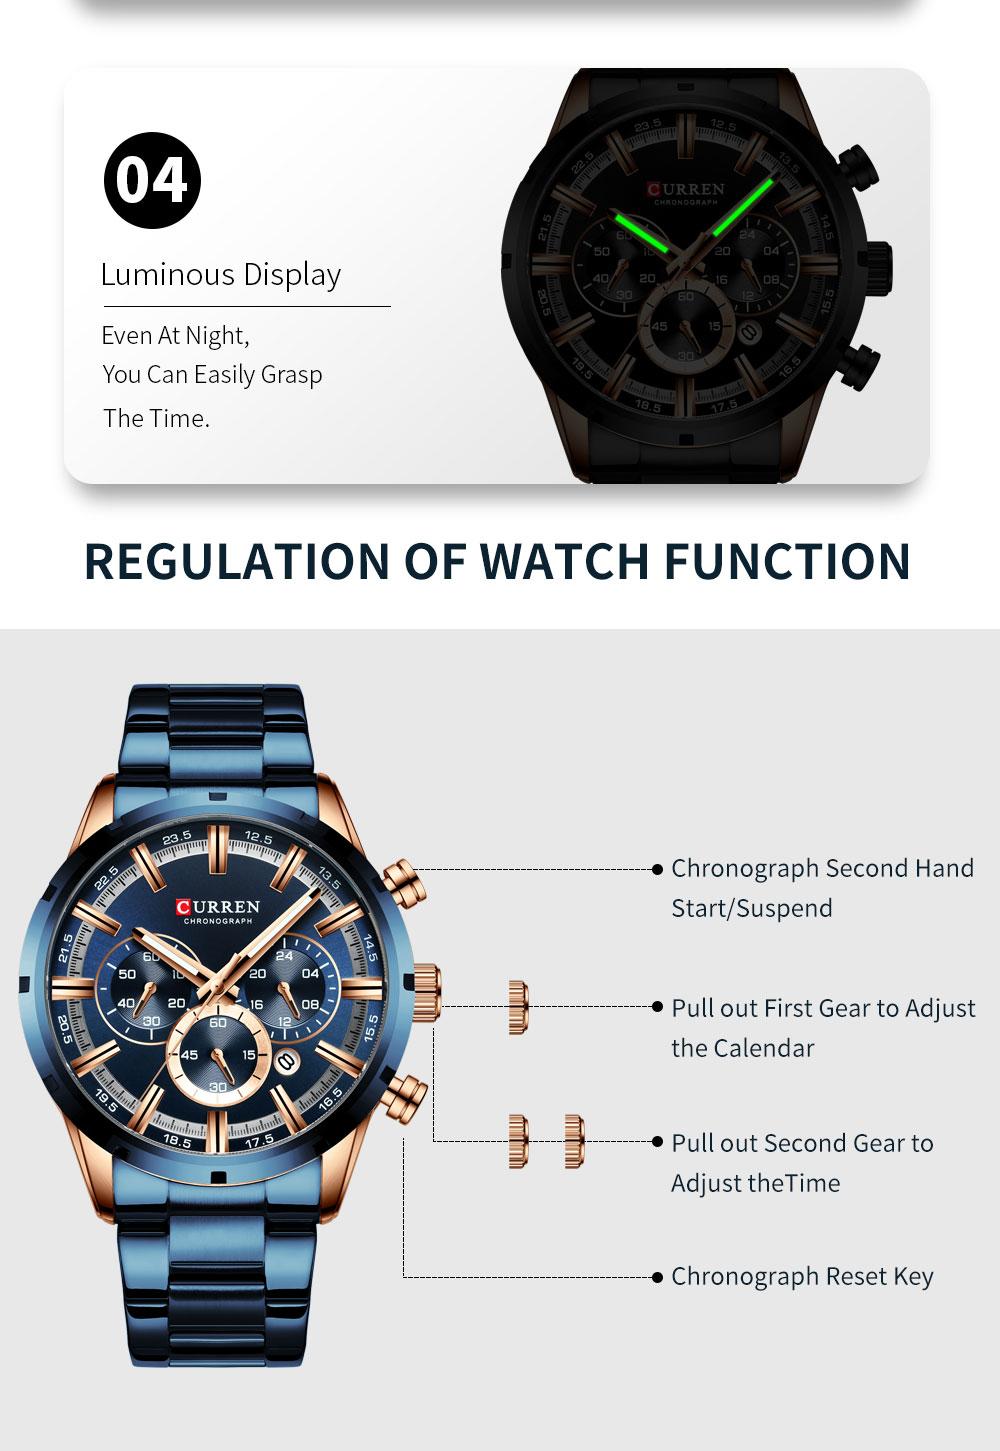 H29a08df6f7af446a95283a24ca81114bl CURREN New Fashion Mens Watches Quartz Chronograph